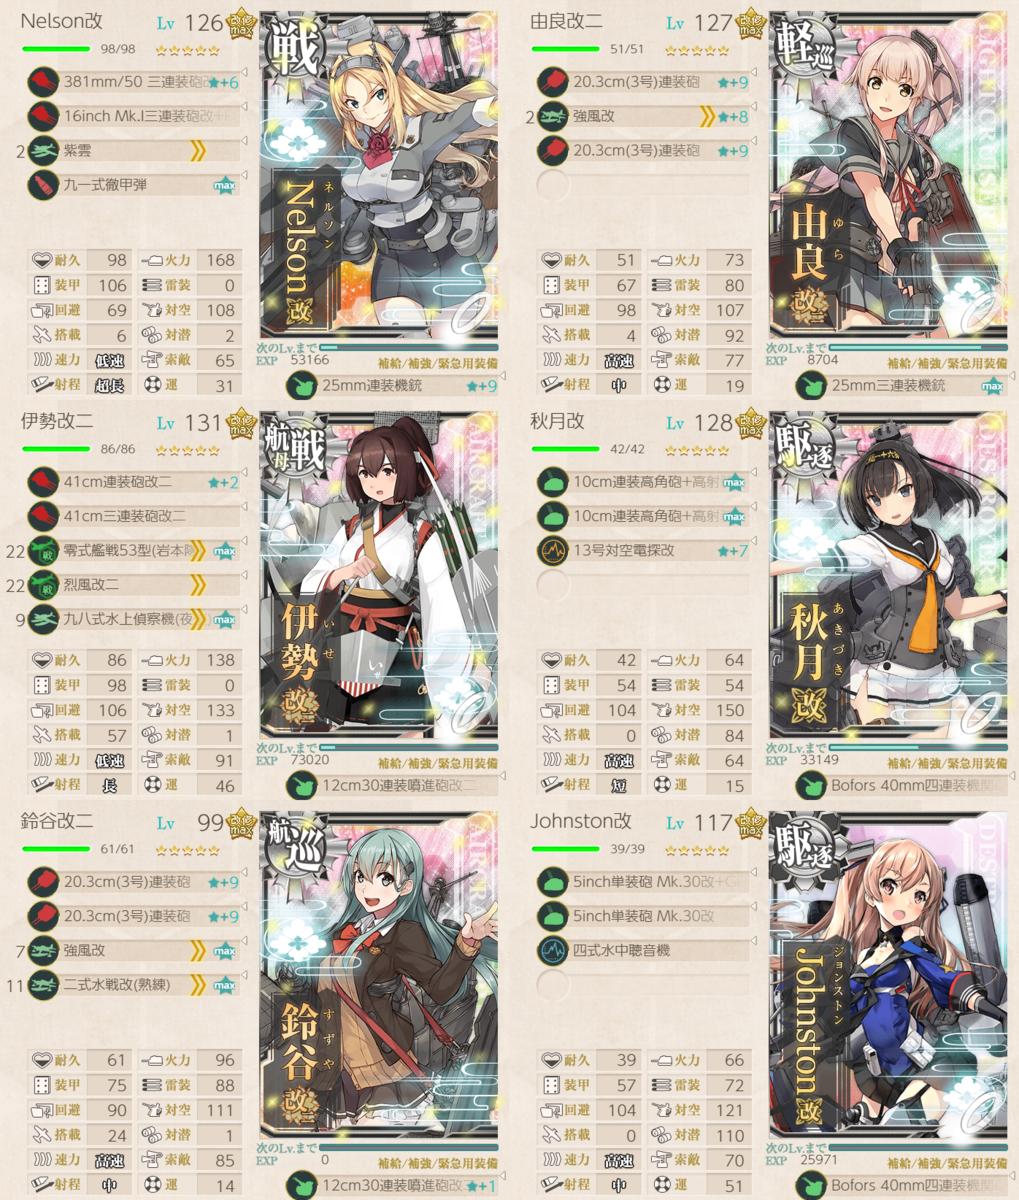 f:id:tarouhakase:20190626085216p:plain